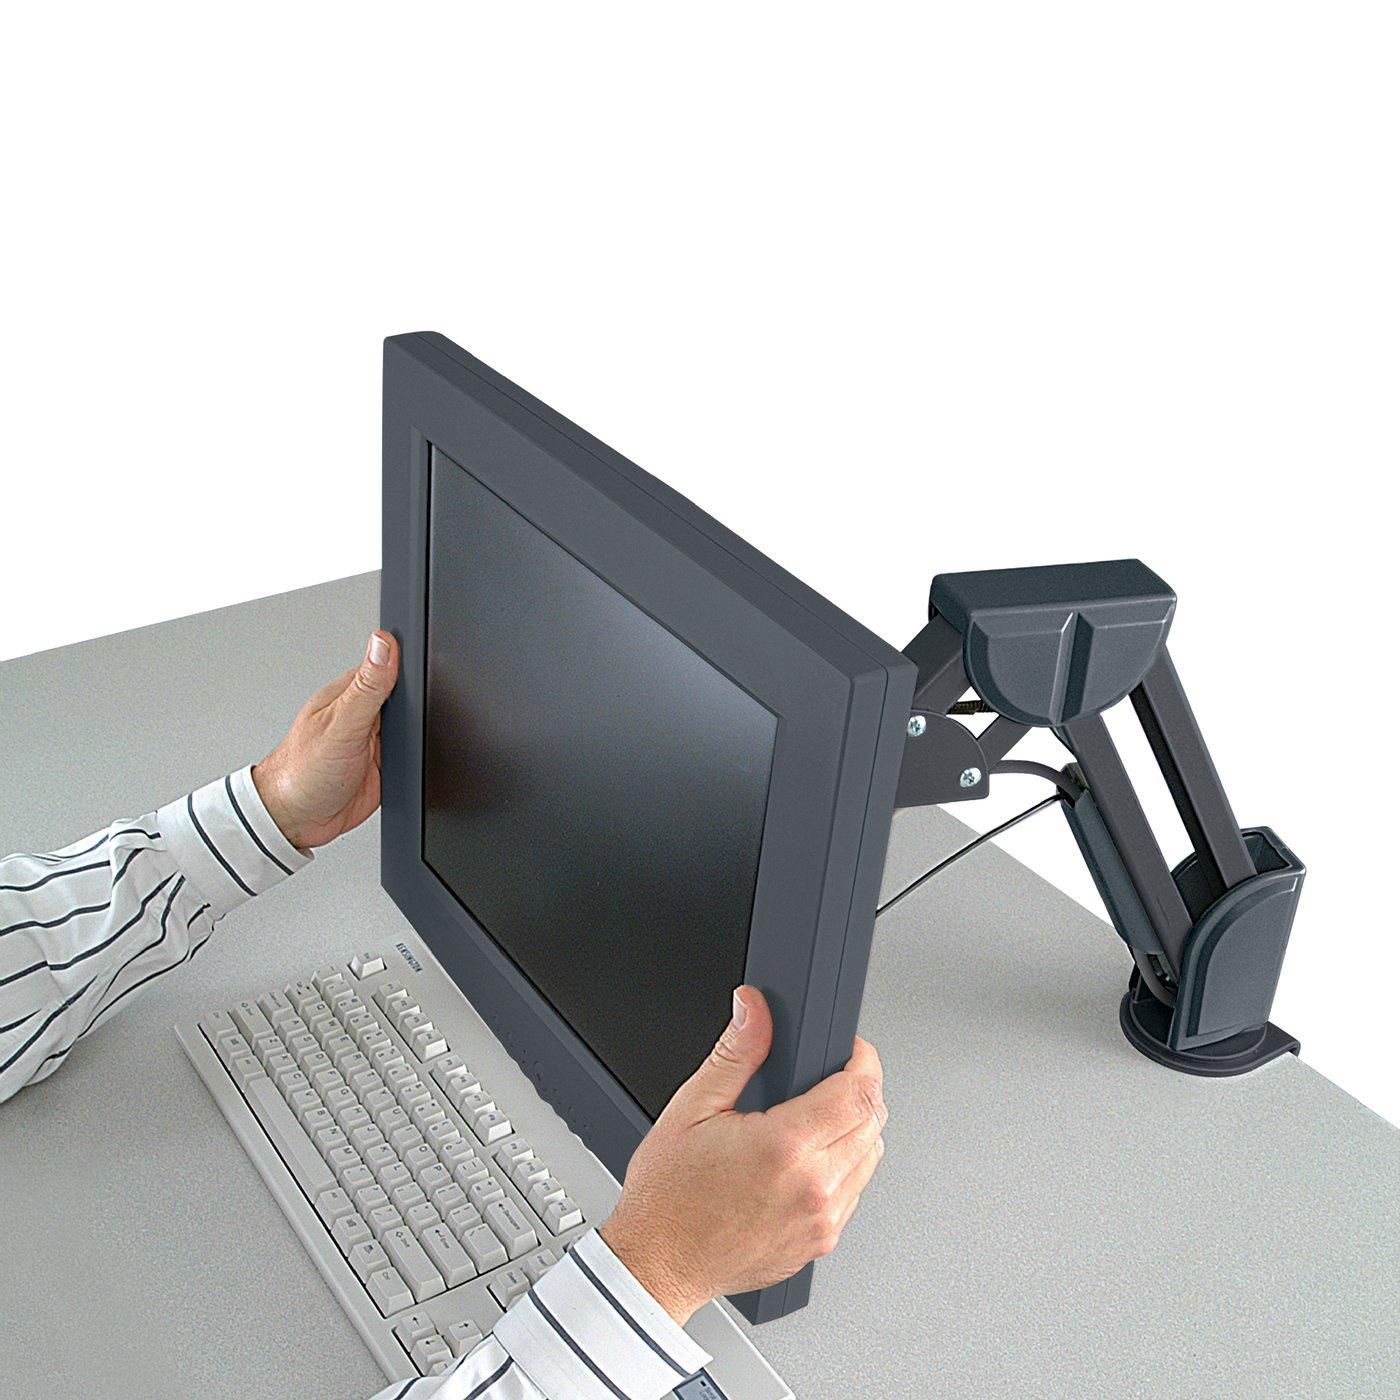 Kensington Products Ergonomics Laptop Risers Monitor Stands